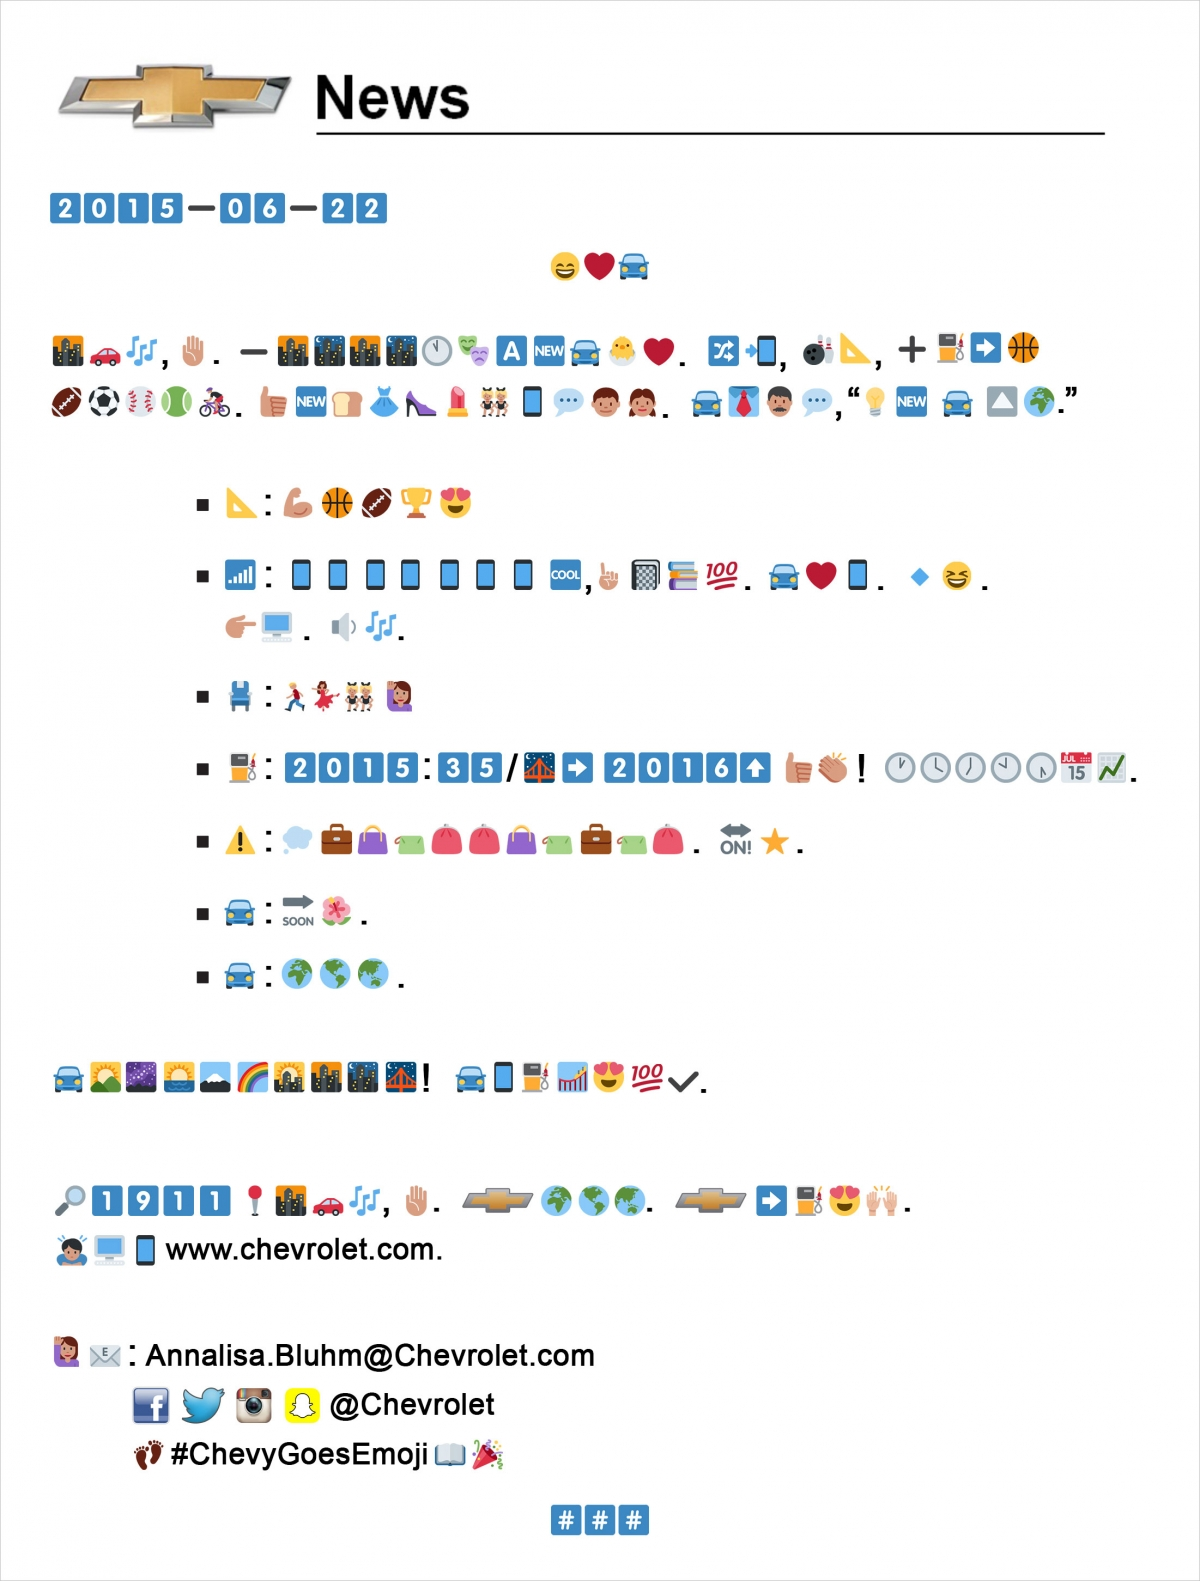 dans-ta-pub-chevrolet-automobile-chevy-cruze-emojis